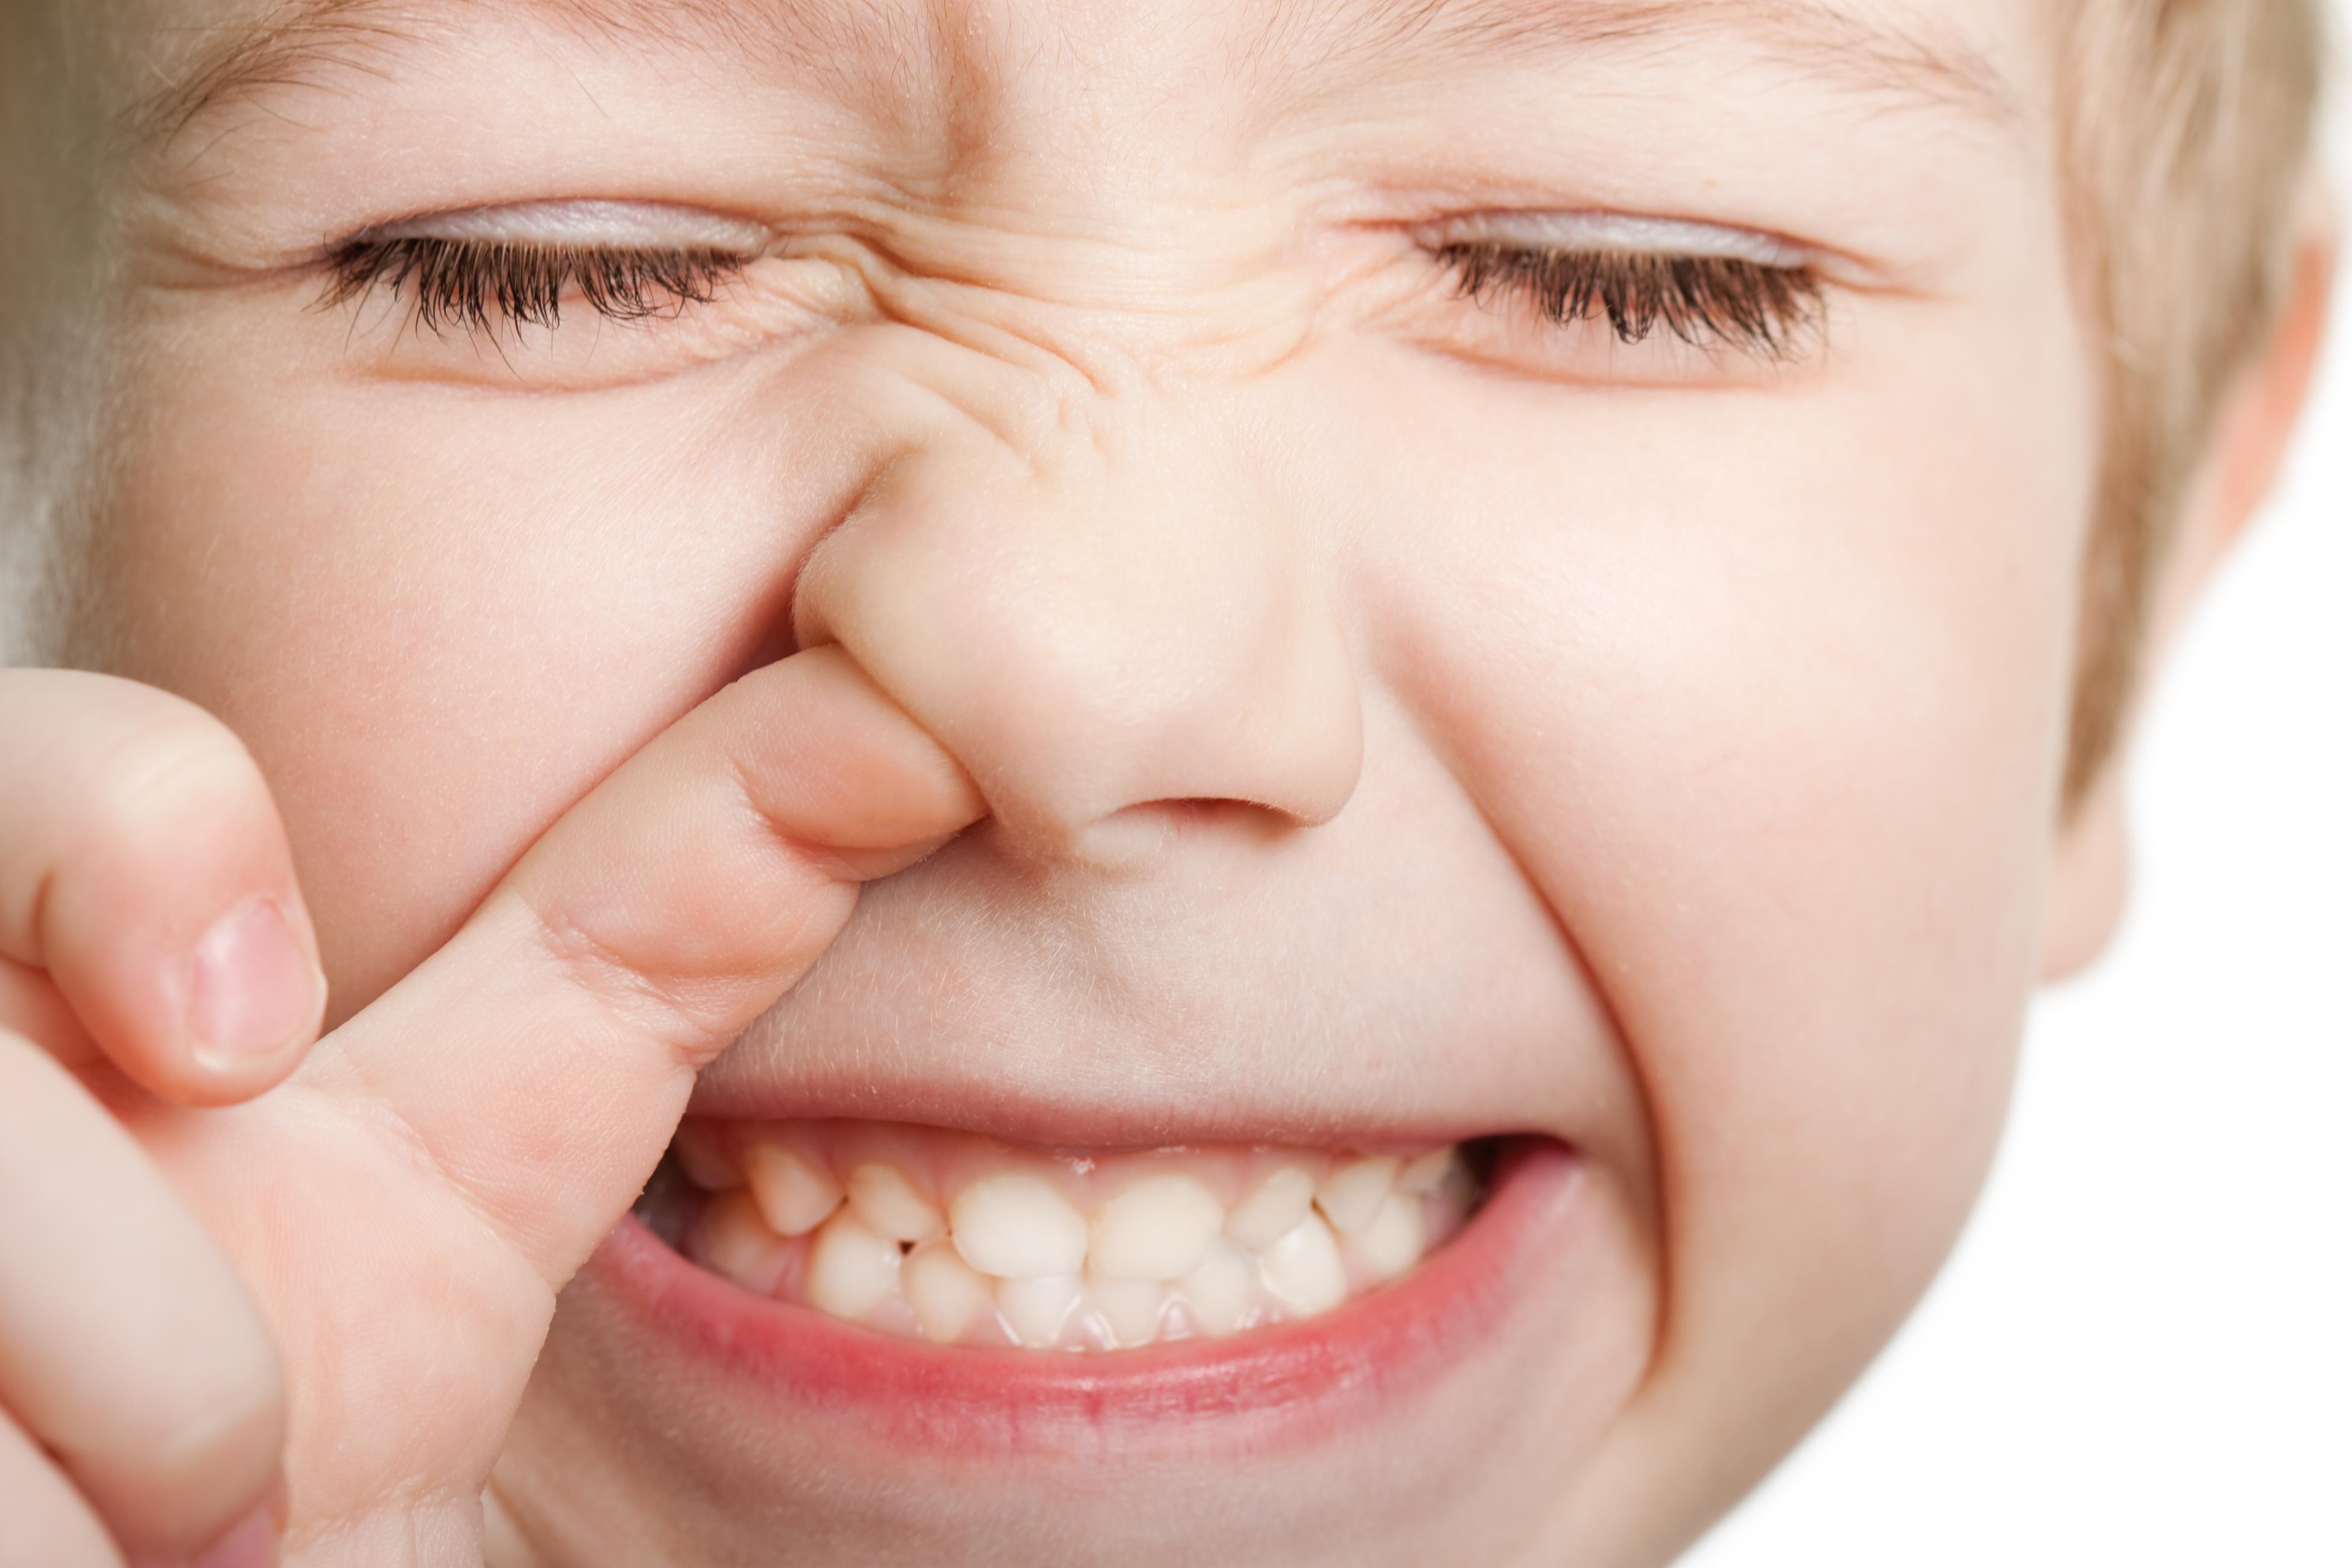 infektion i näsan symptom